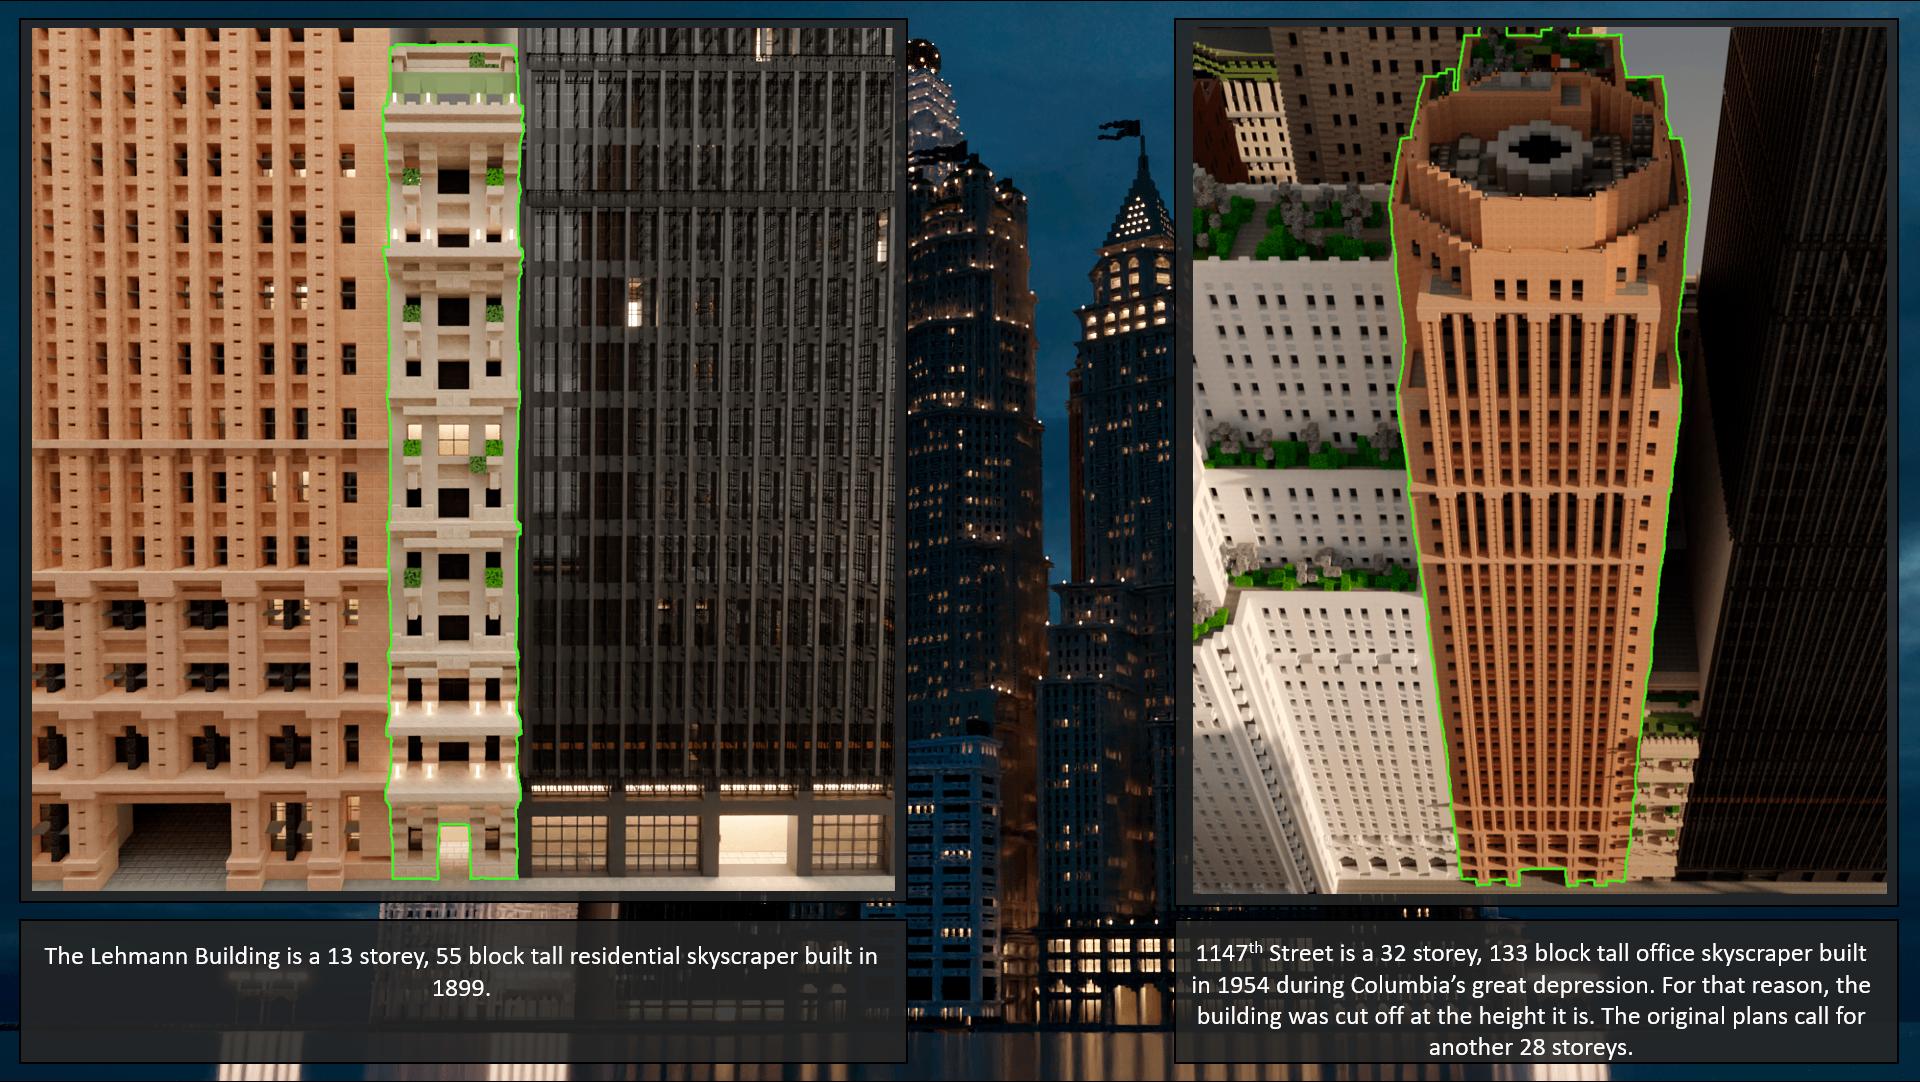 Leviticus & Gilmore Street   Columbia   Lapusian Kingdom Minecraft Map